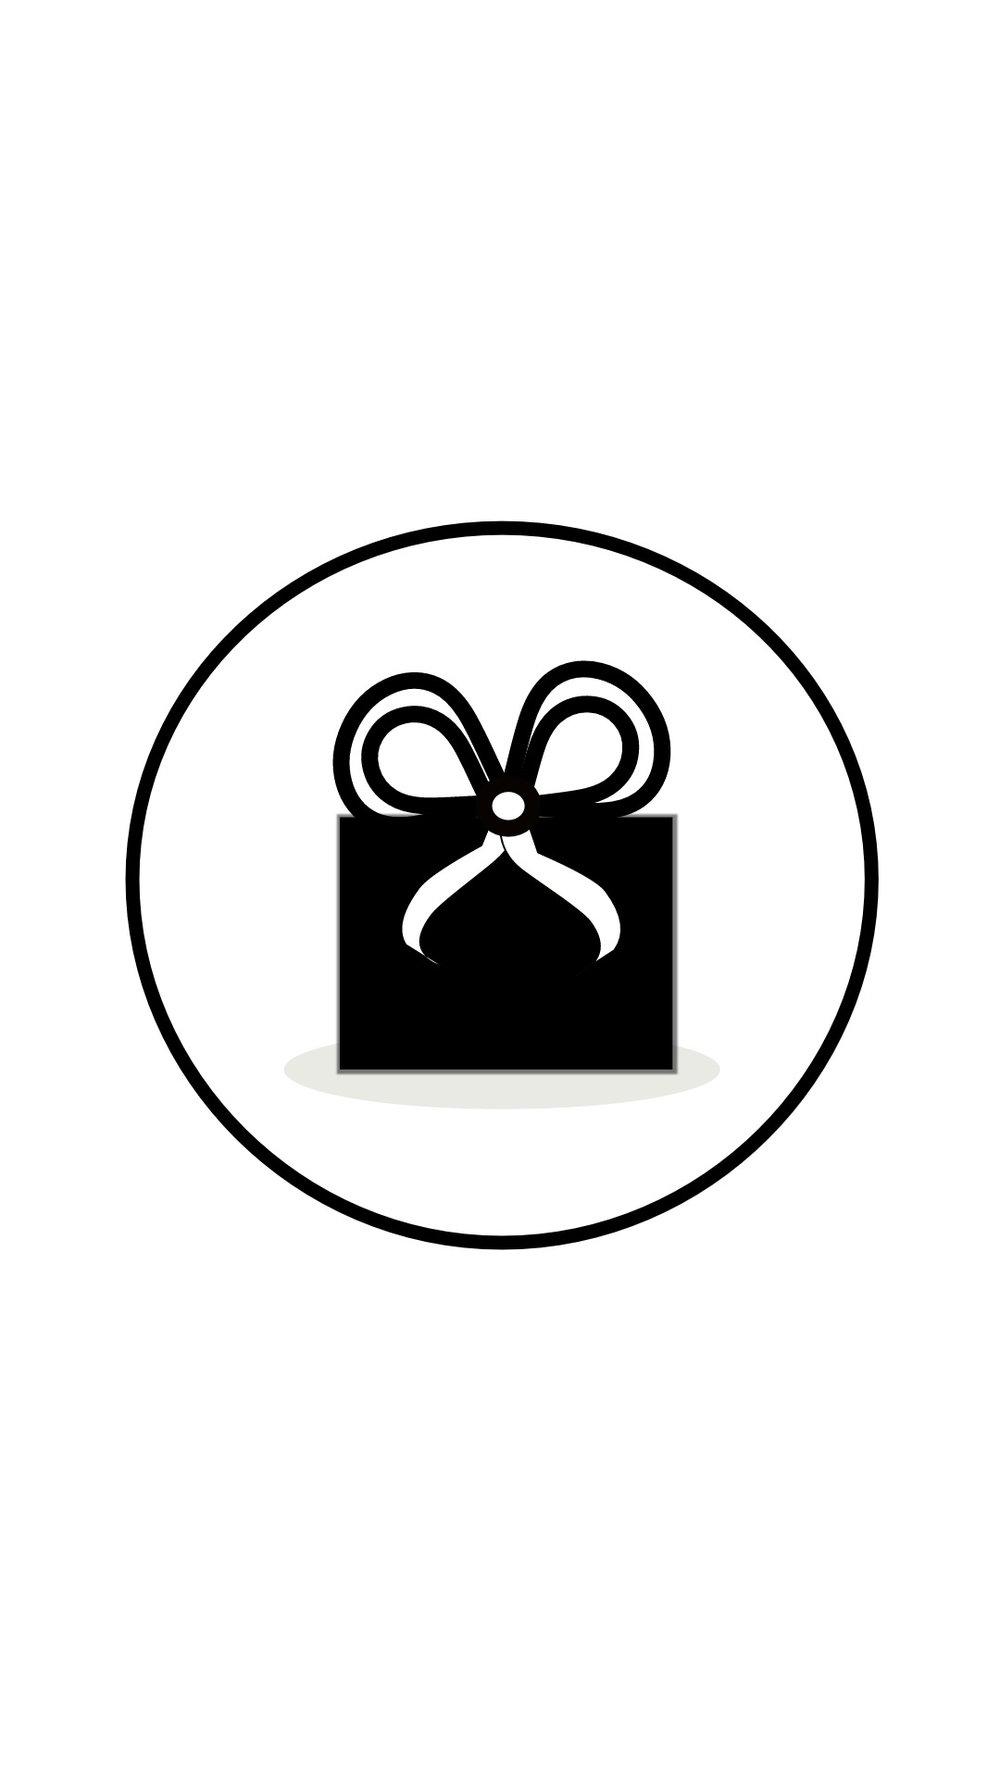 Instagram-cover-box-blackwhite-lotnotes.com.jpg